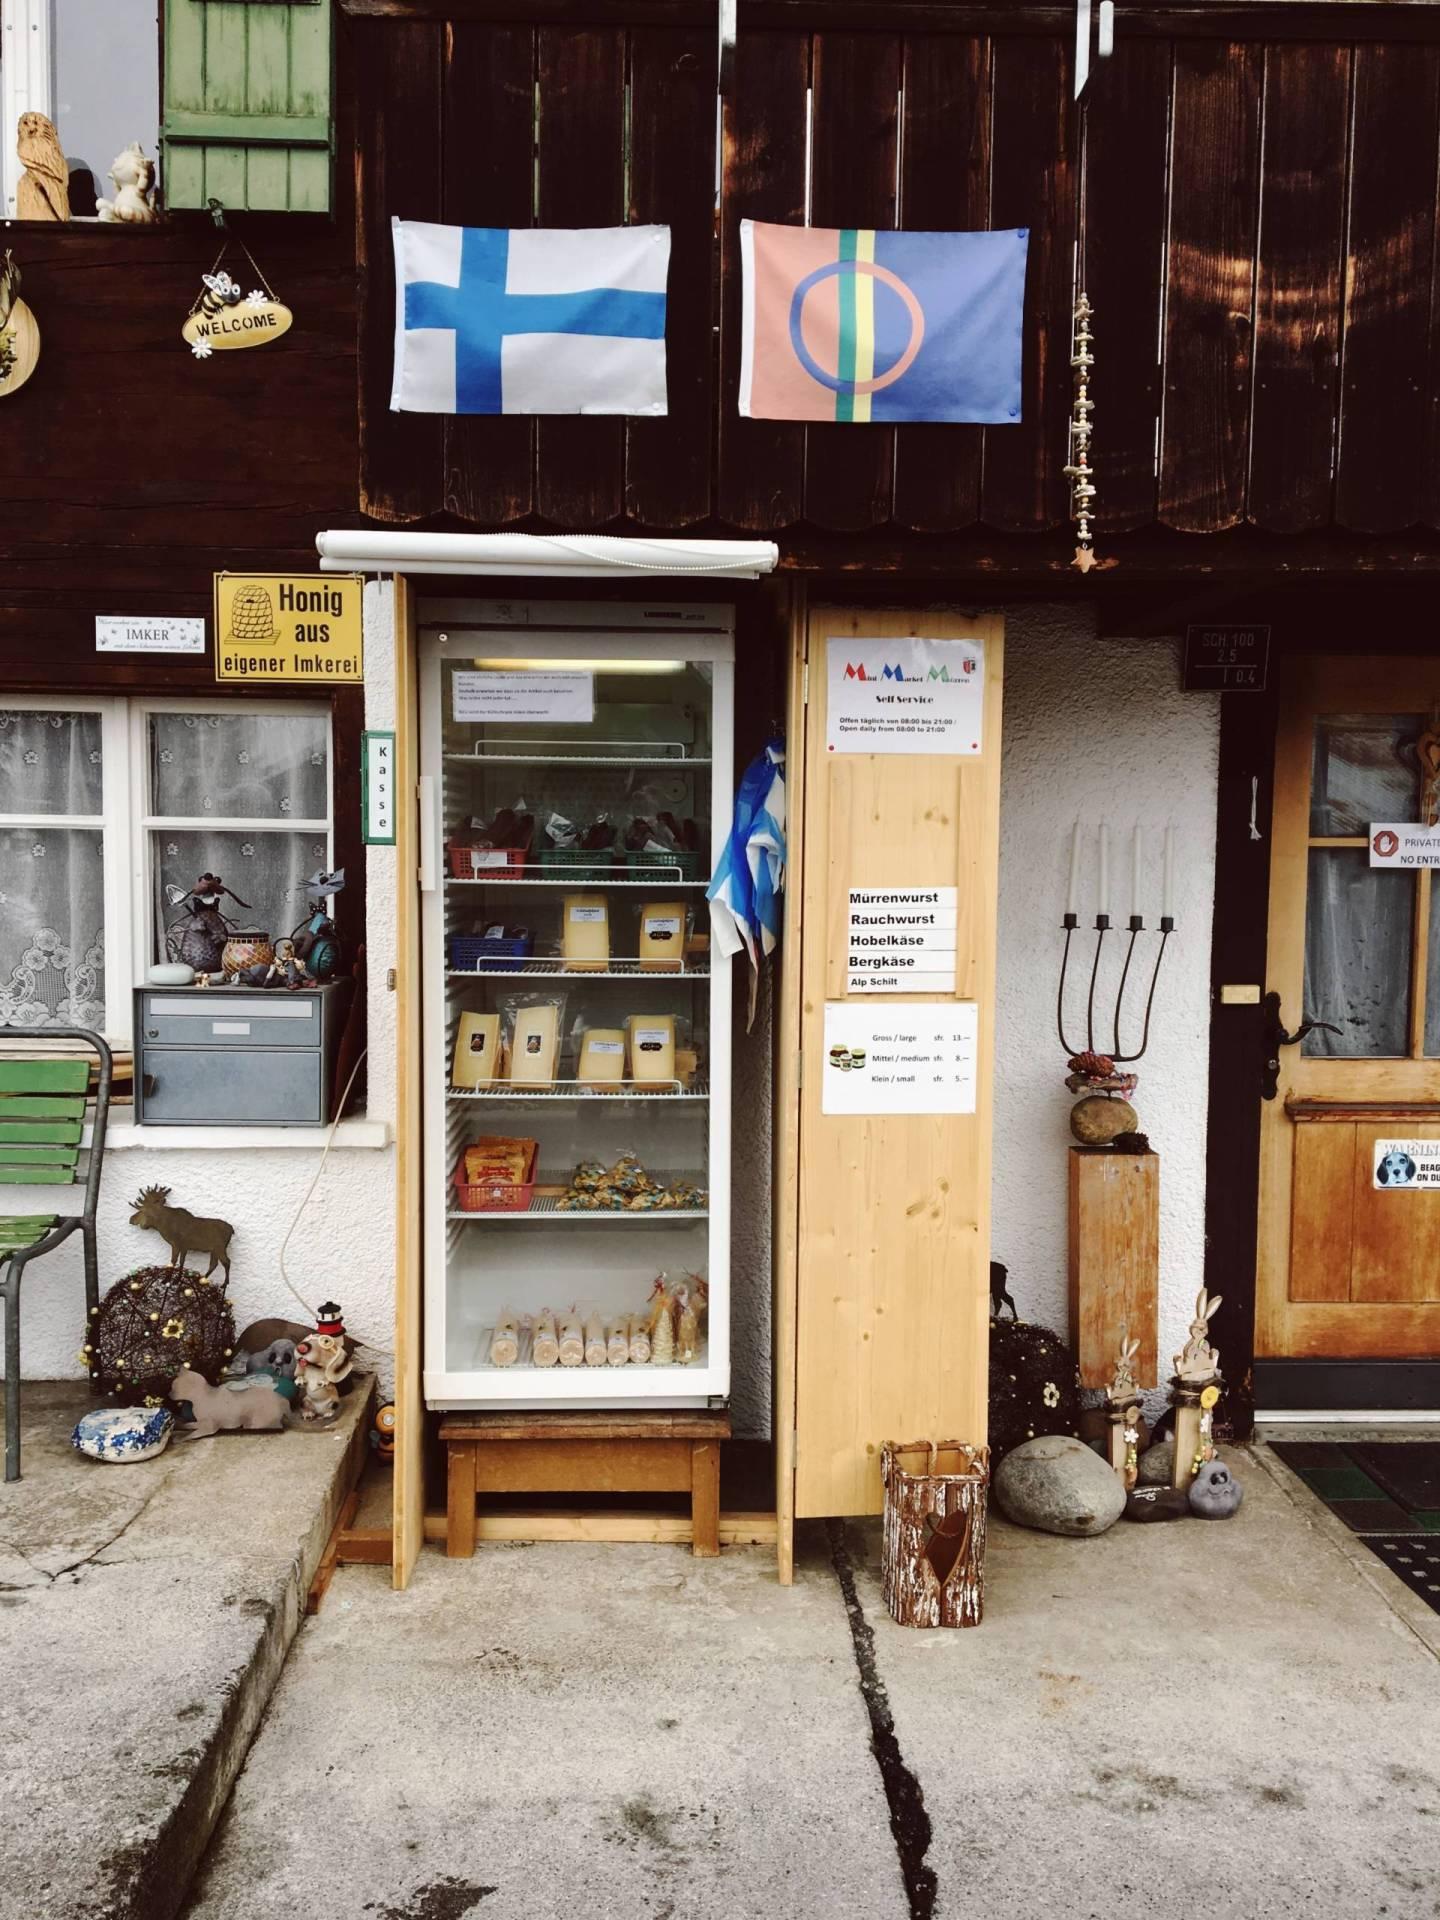 The Honesty Shop